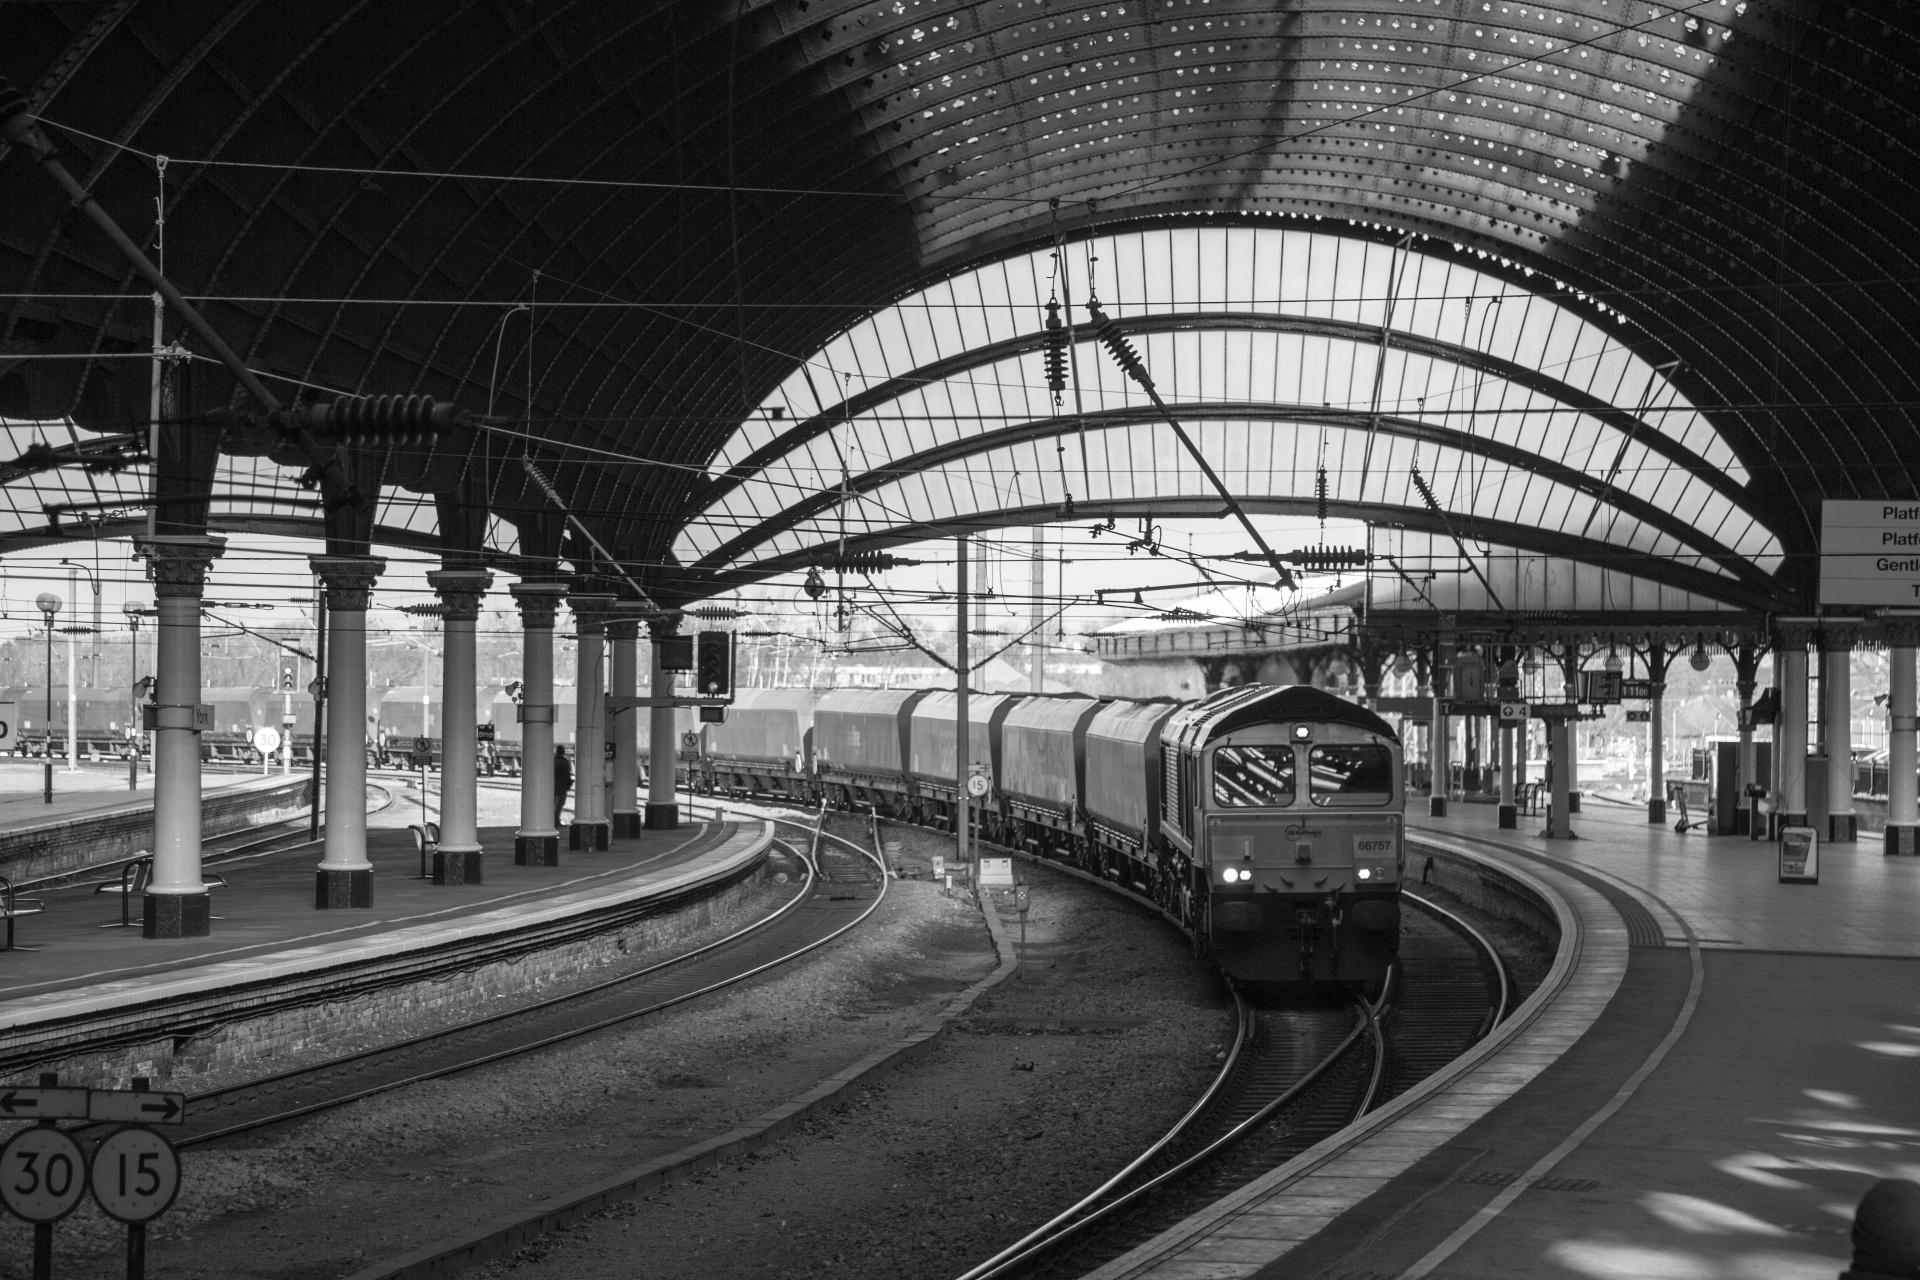 Train Station Platform Free Stock Photo - Public Domain Pictures